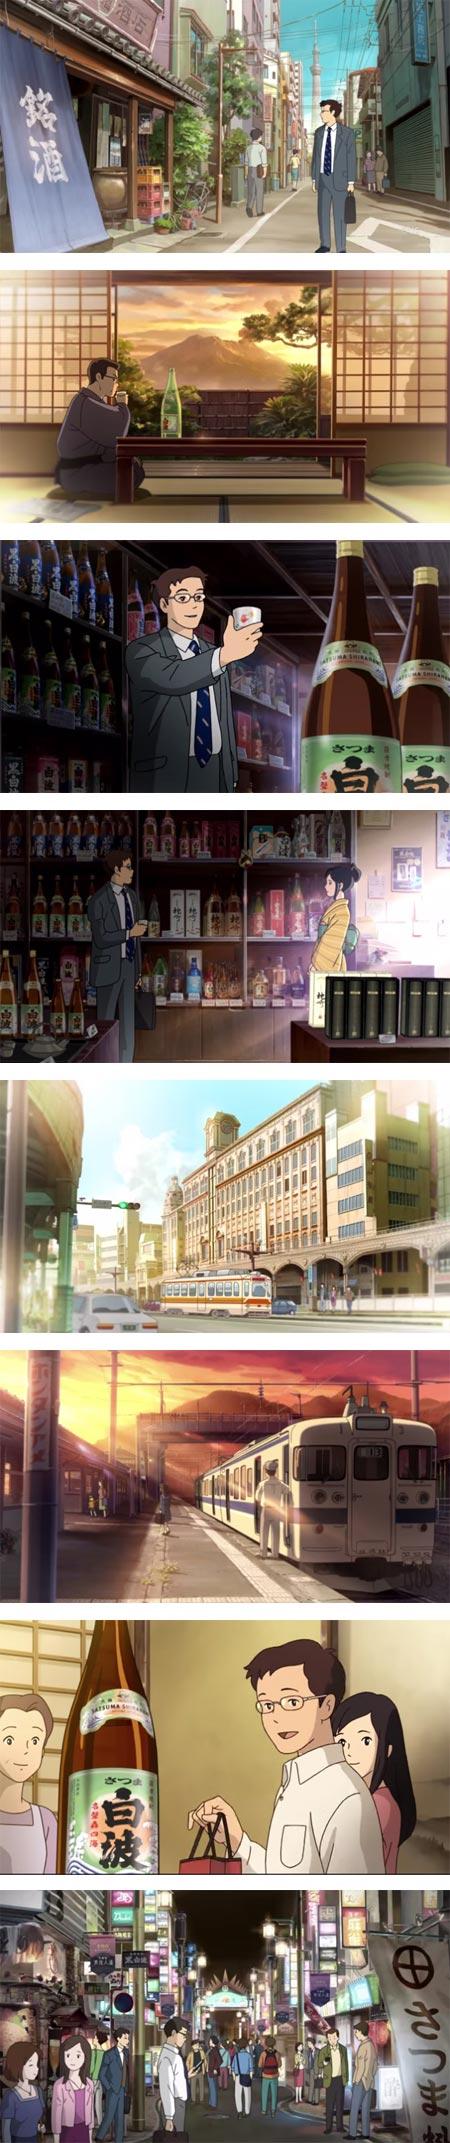 Yoshiharu Sato's Studio Ghibli style TV commercial